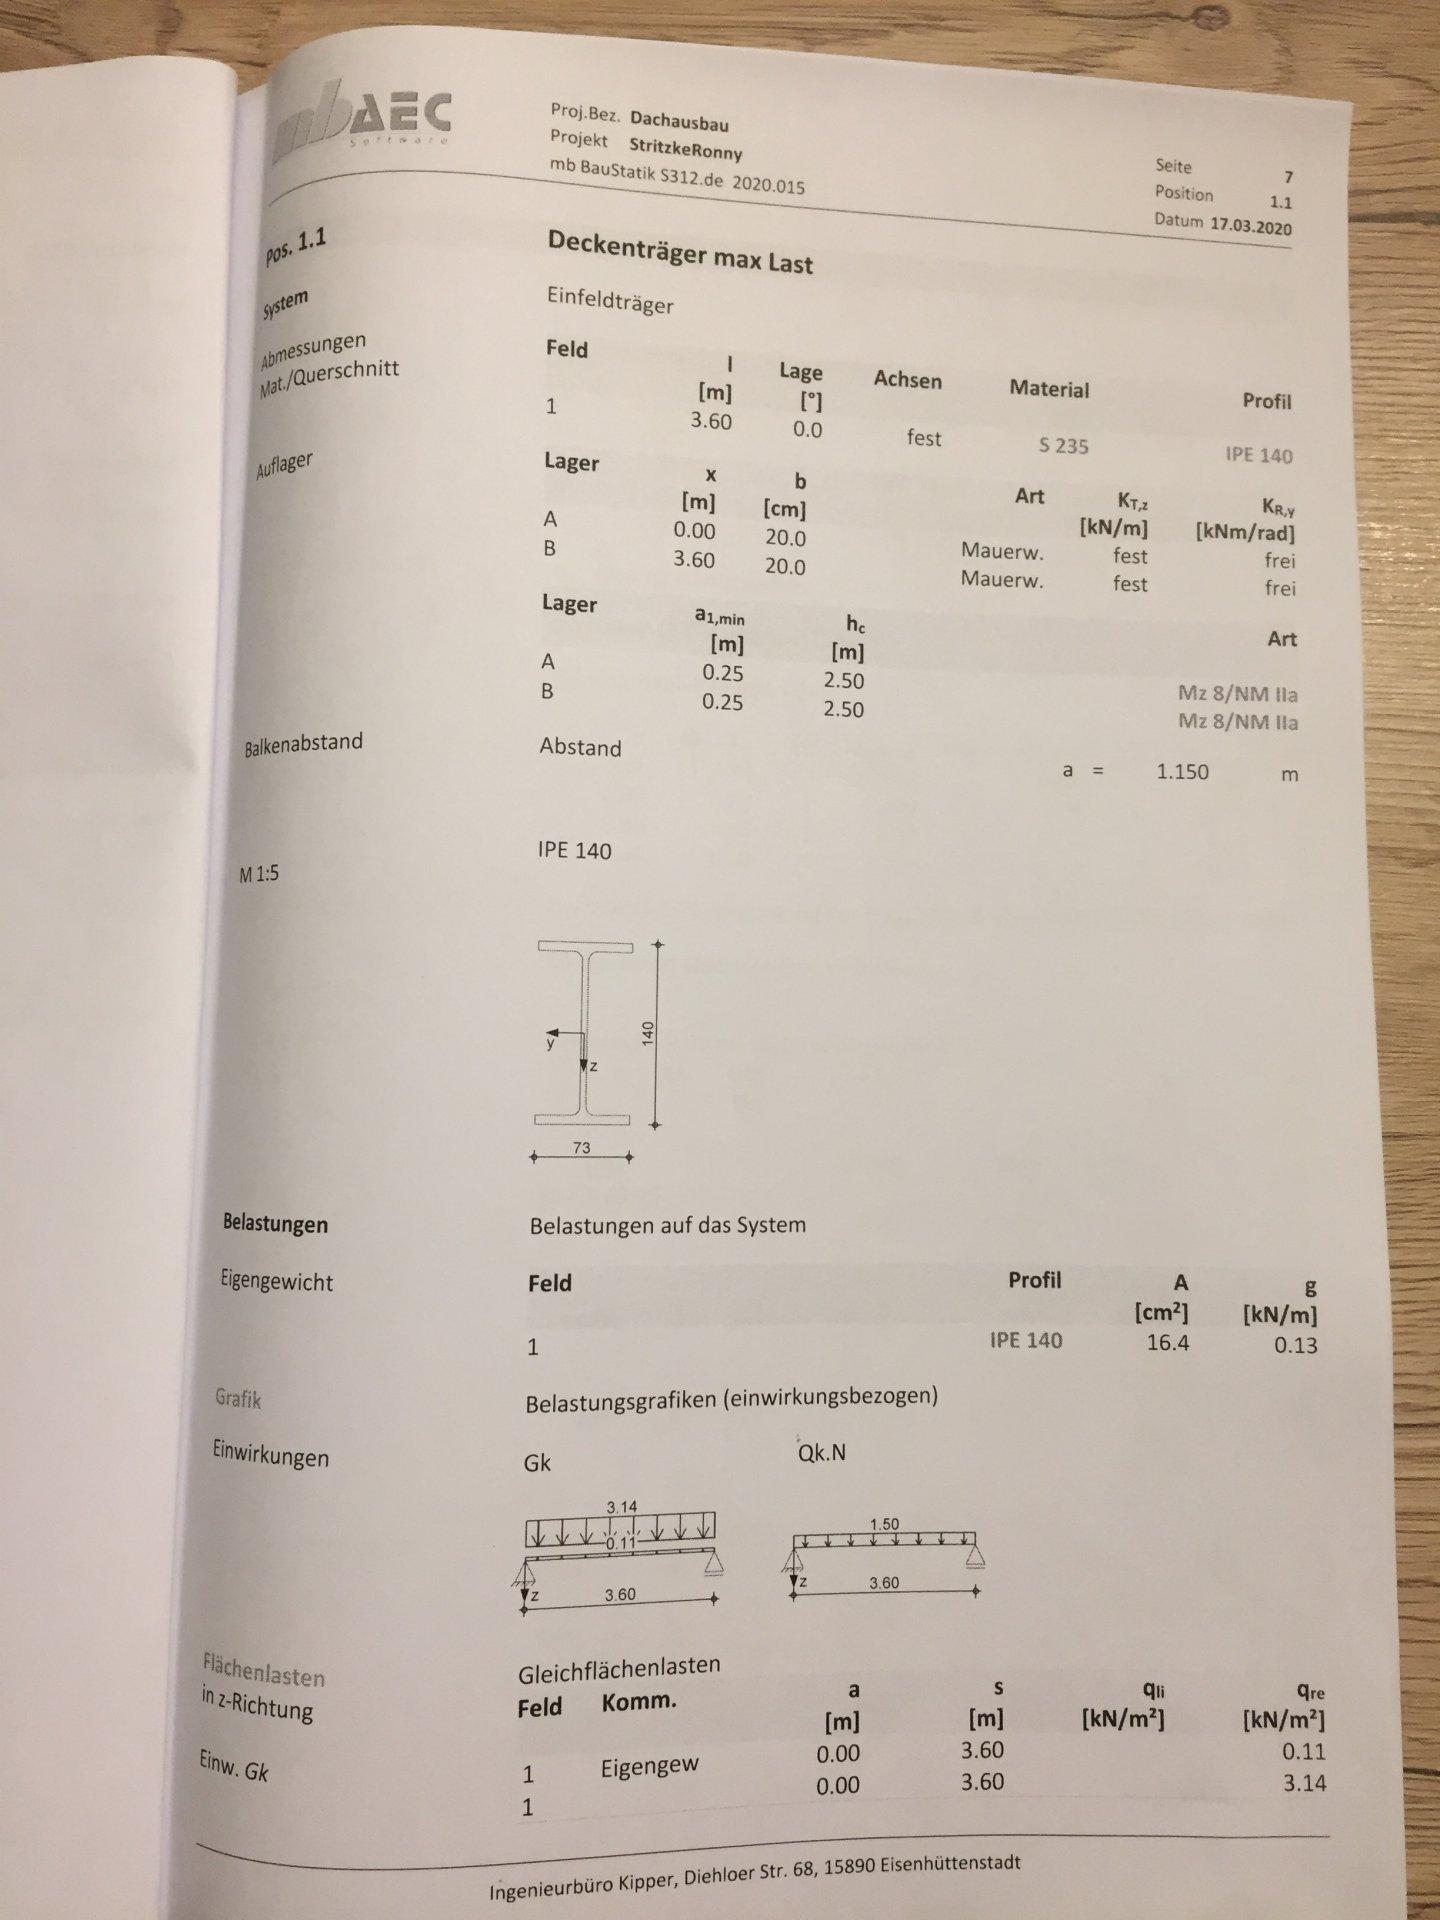 619E9BAF-64F8-4C39-812B-D830A8582300.jpeg